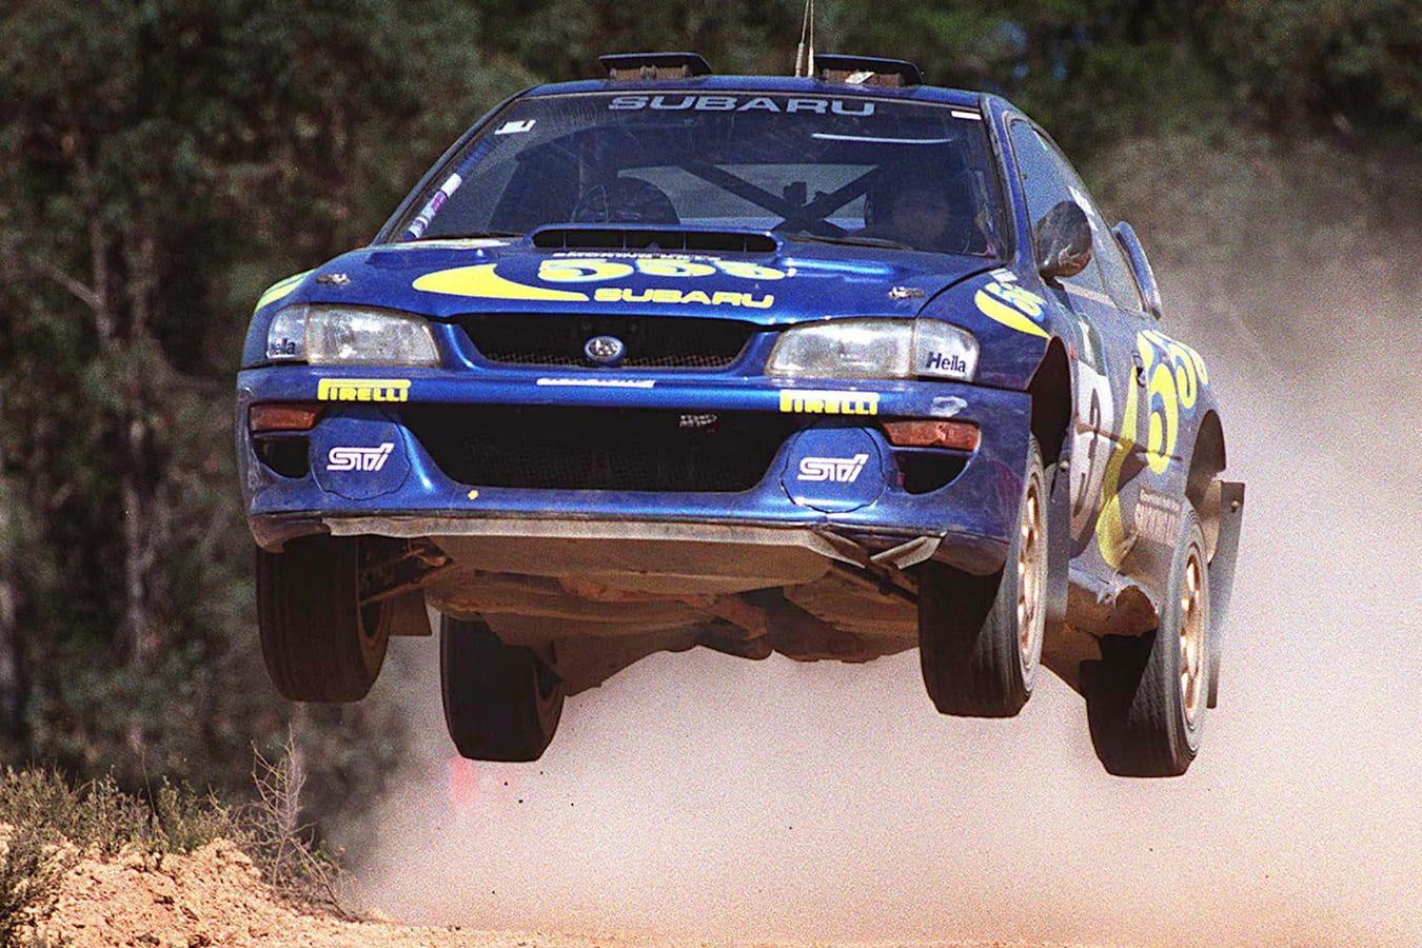 Subaru Impreza Wrx Sti Jump Jpg